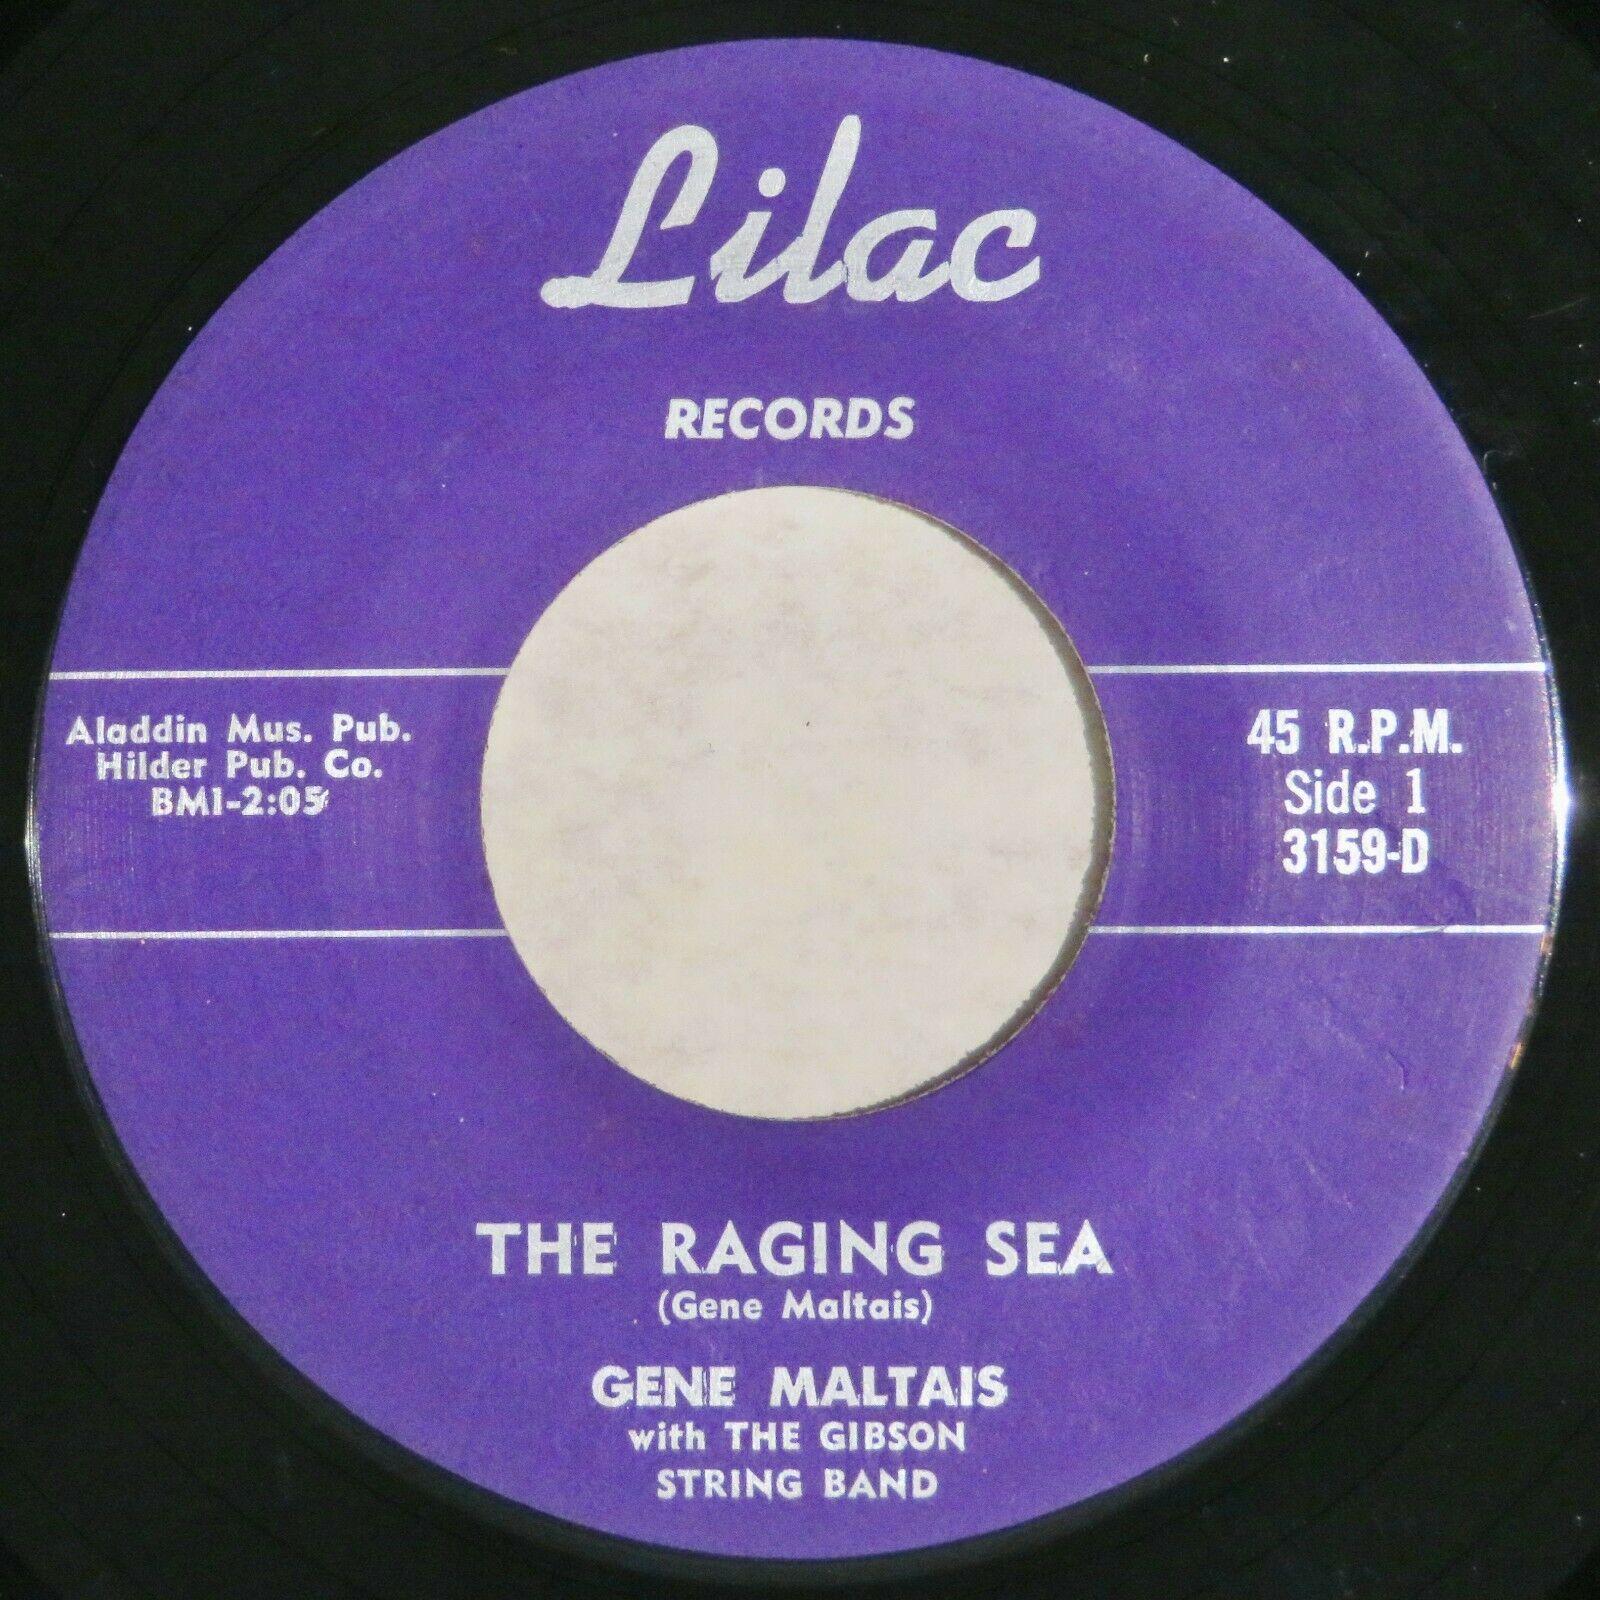 LILAC 3159 Gene Maltais Orig RARE Rockabilly 45 The Raging Sea Mint Minus